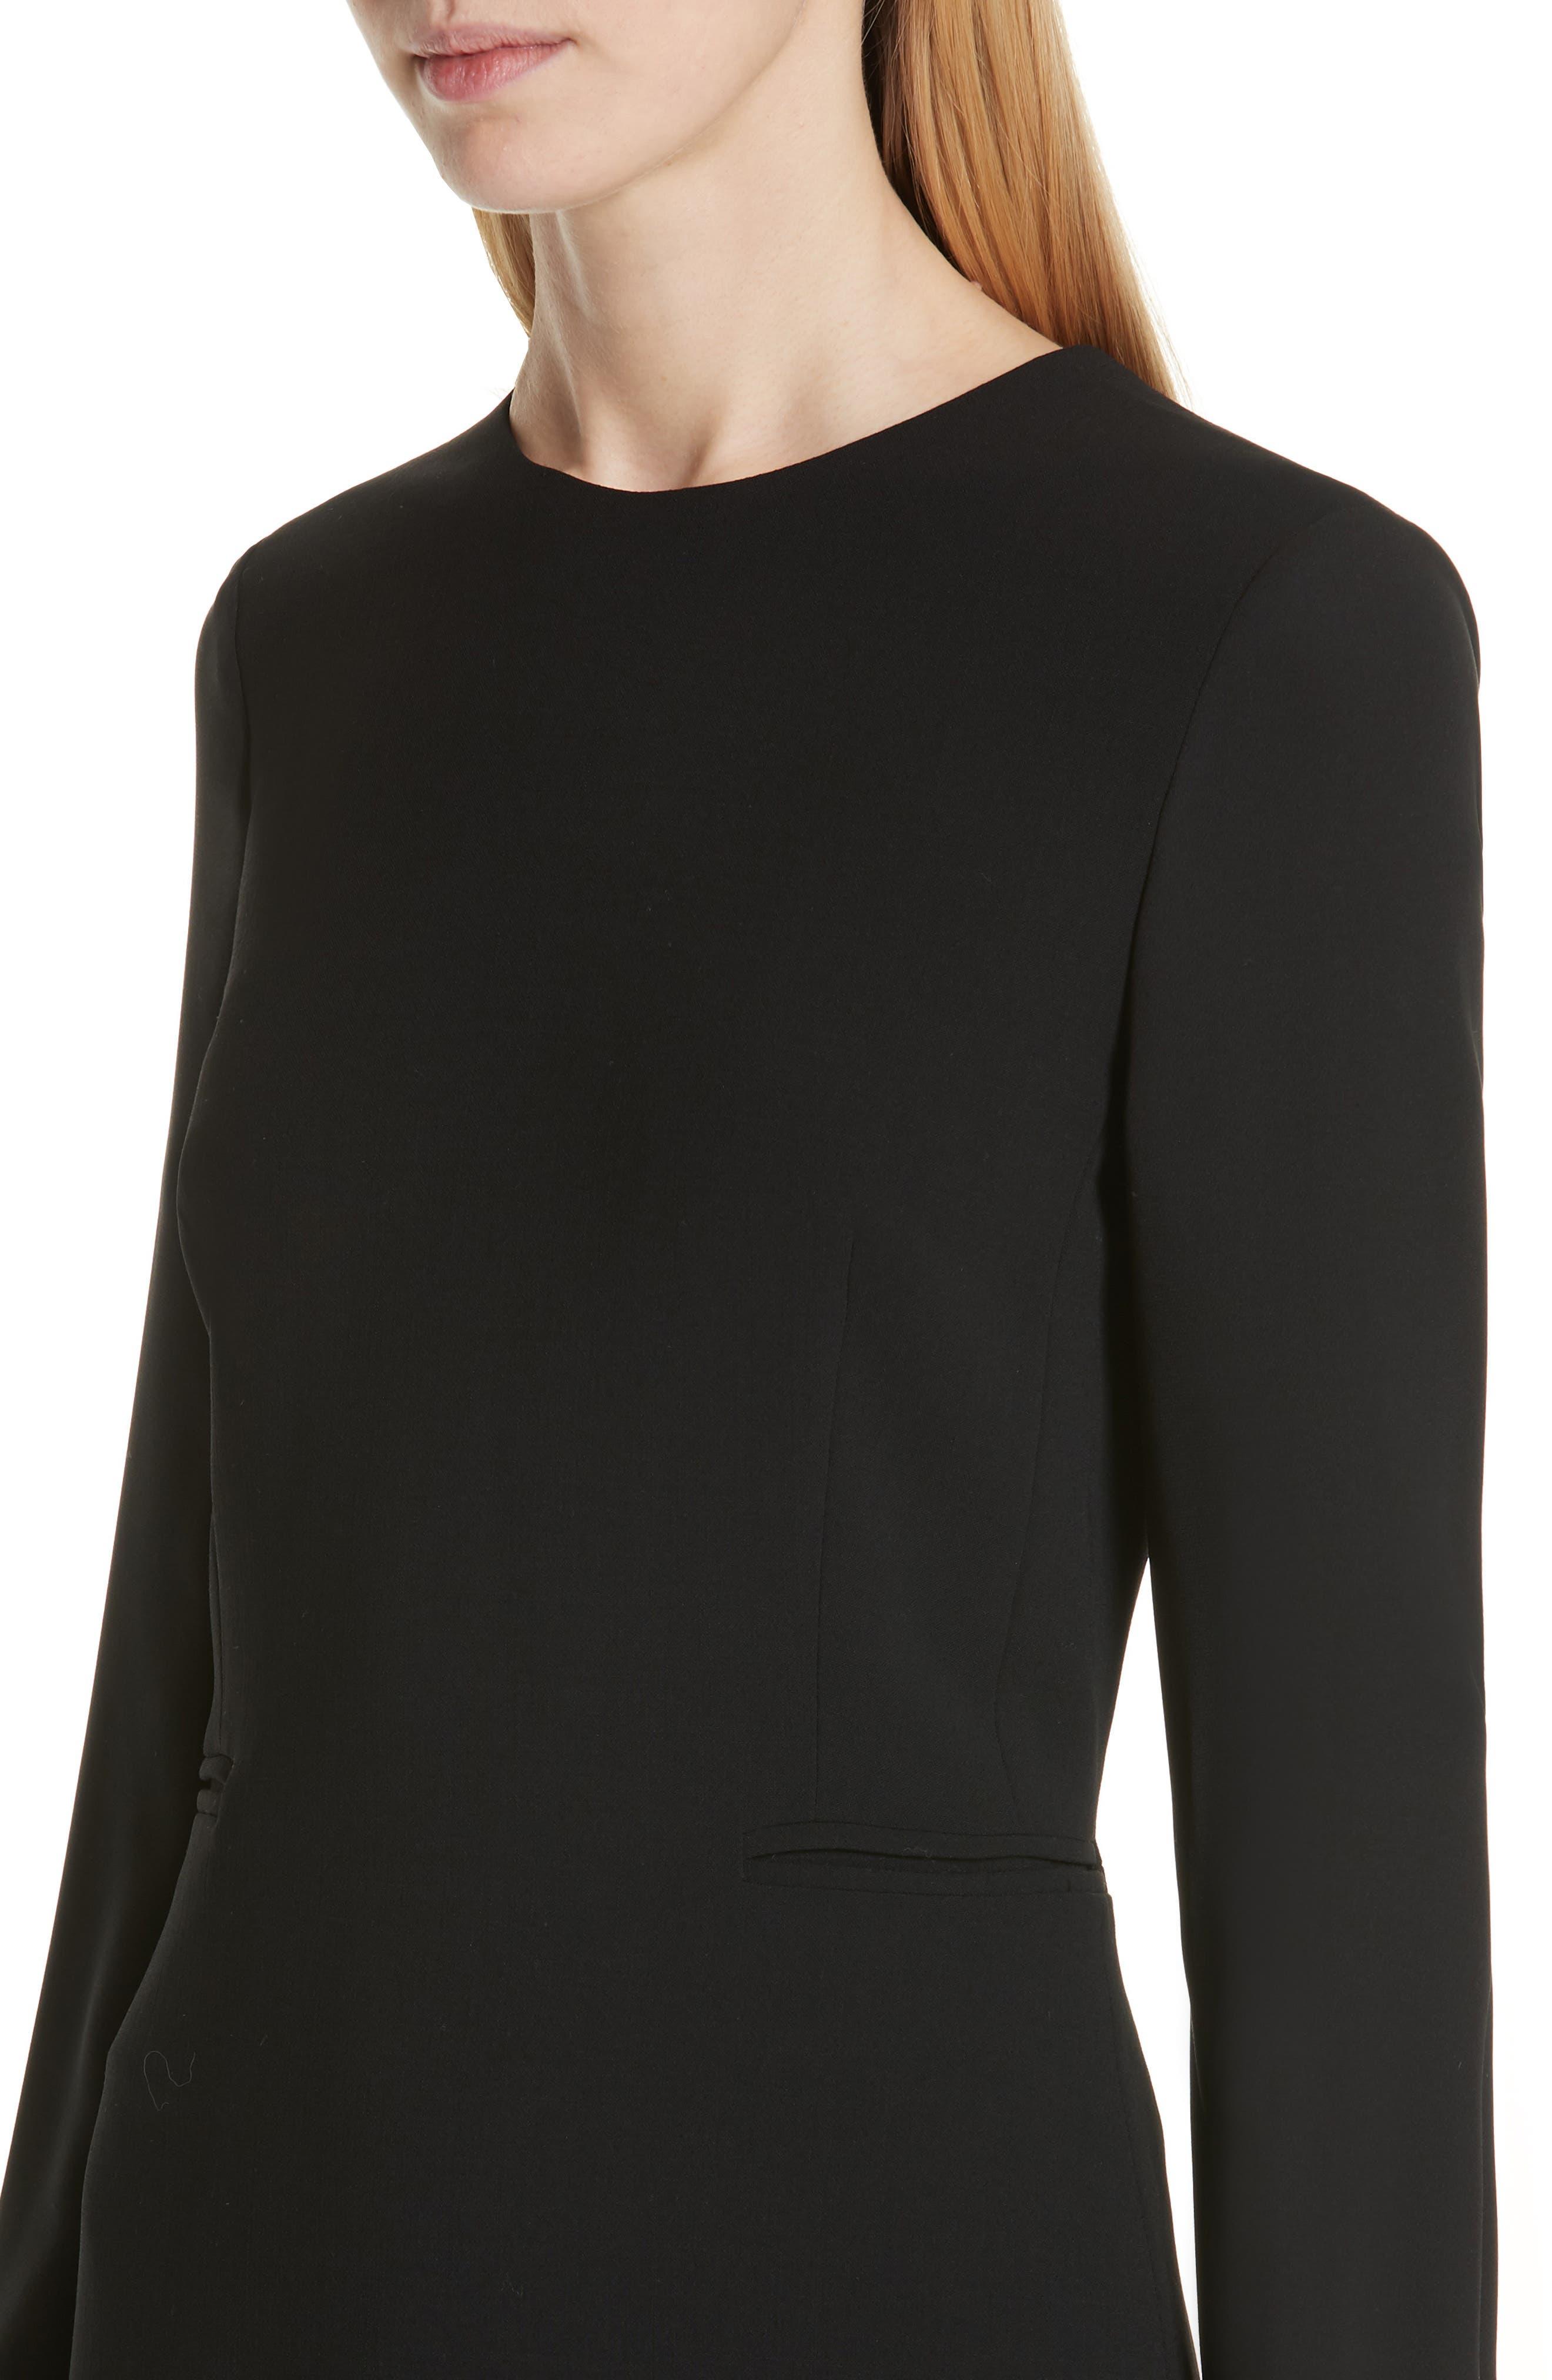 Ottelia Stretch Wool Sheath Dress,                             Alternate thumbnail 4, color,                             BLACK